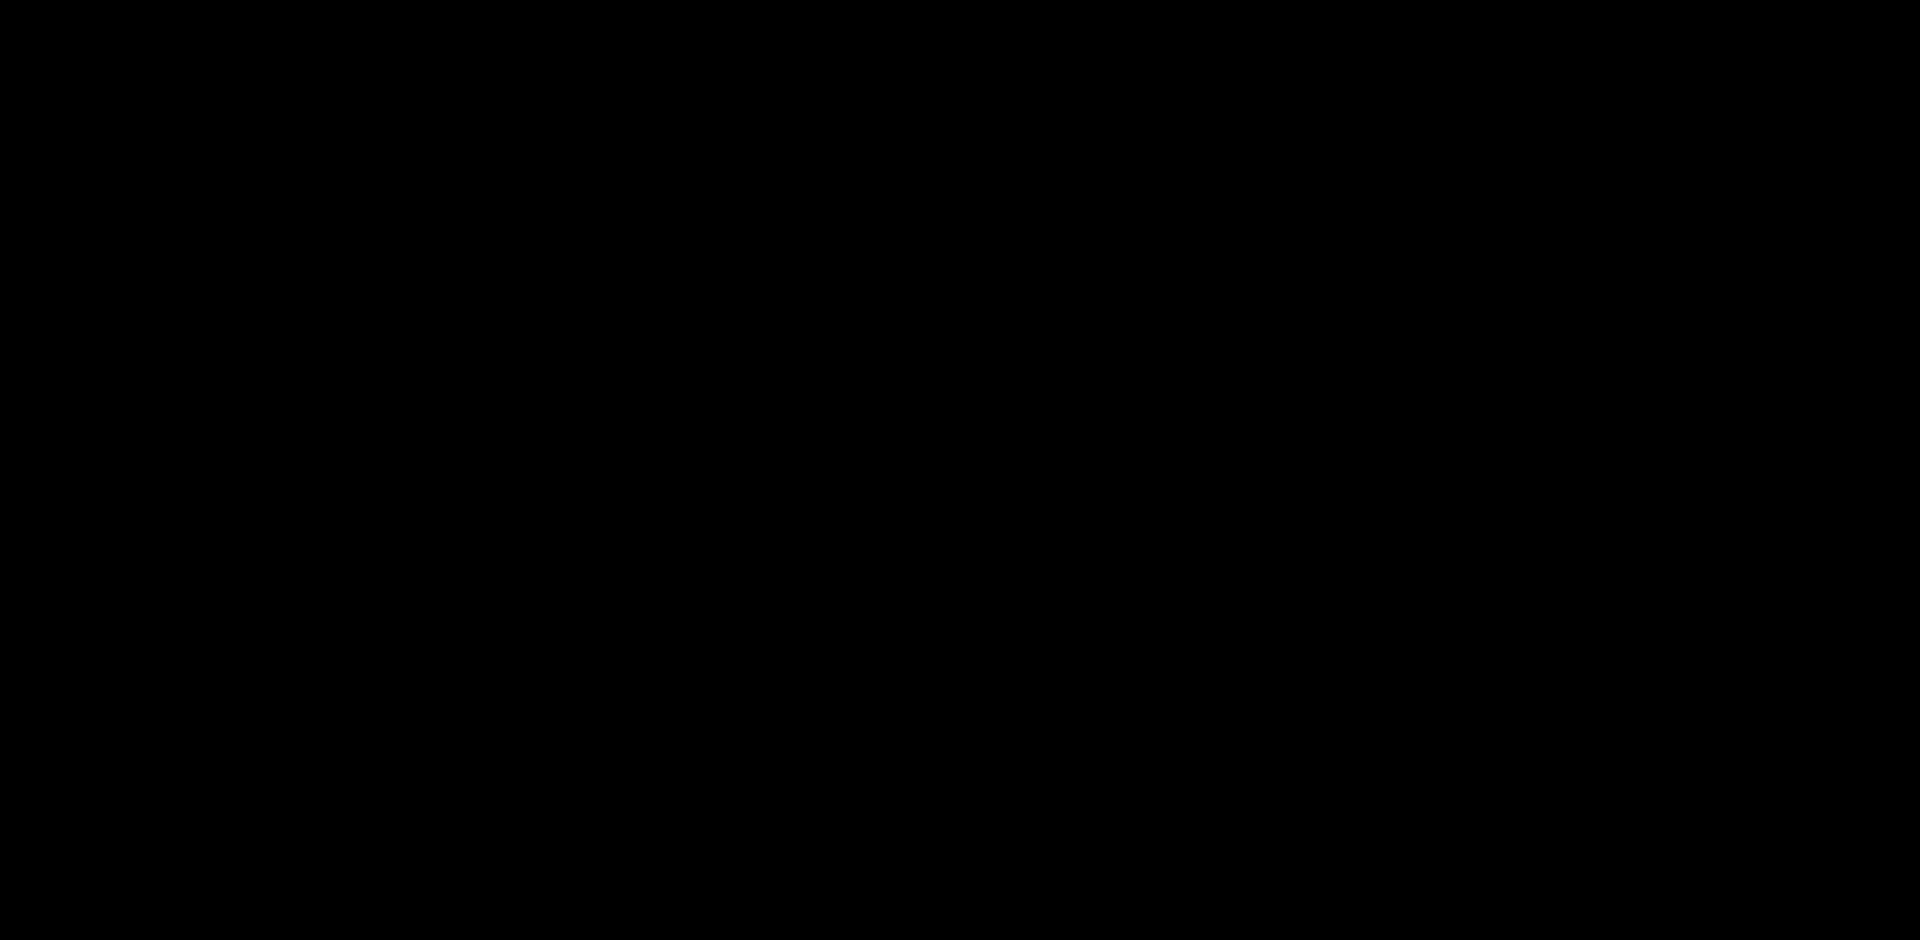 SOAP_STONE_Amb_02_Frios_WEB.jpg